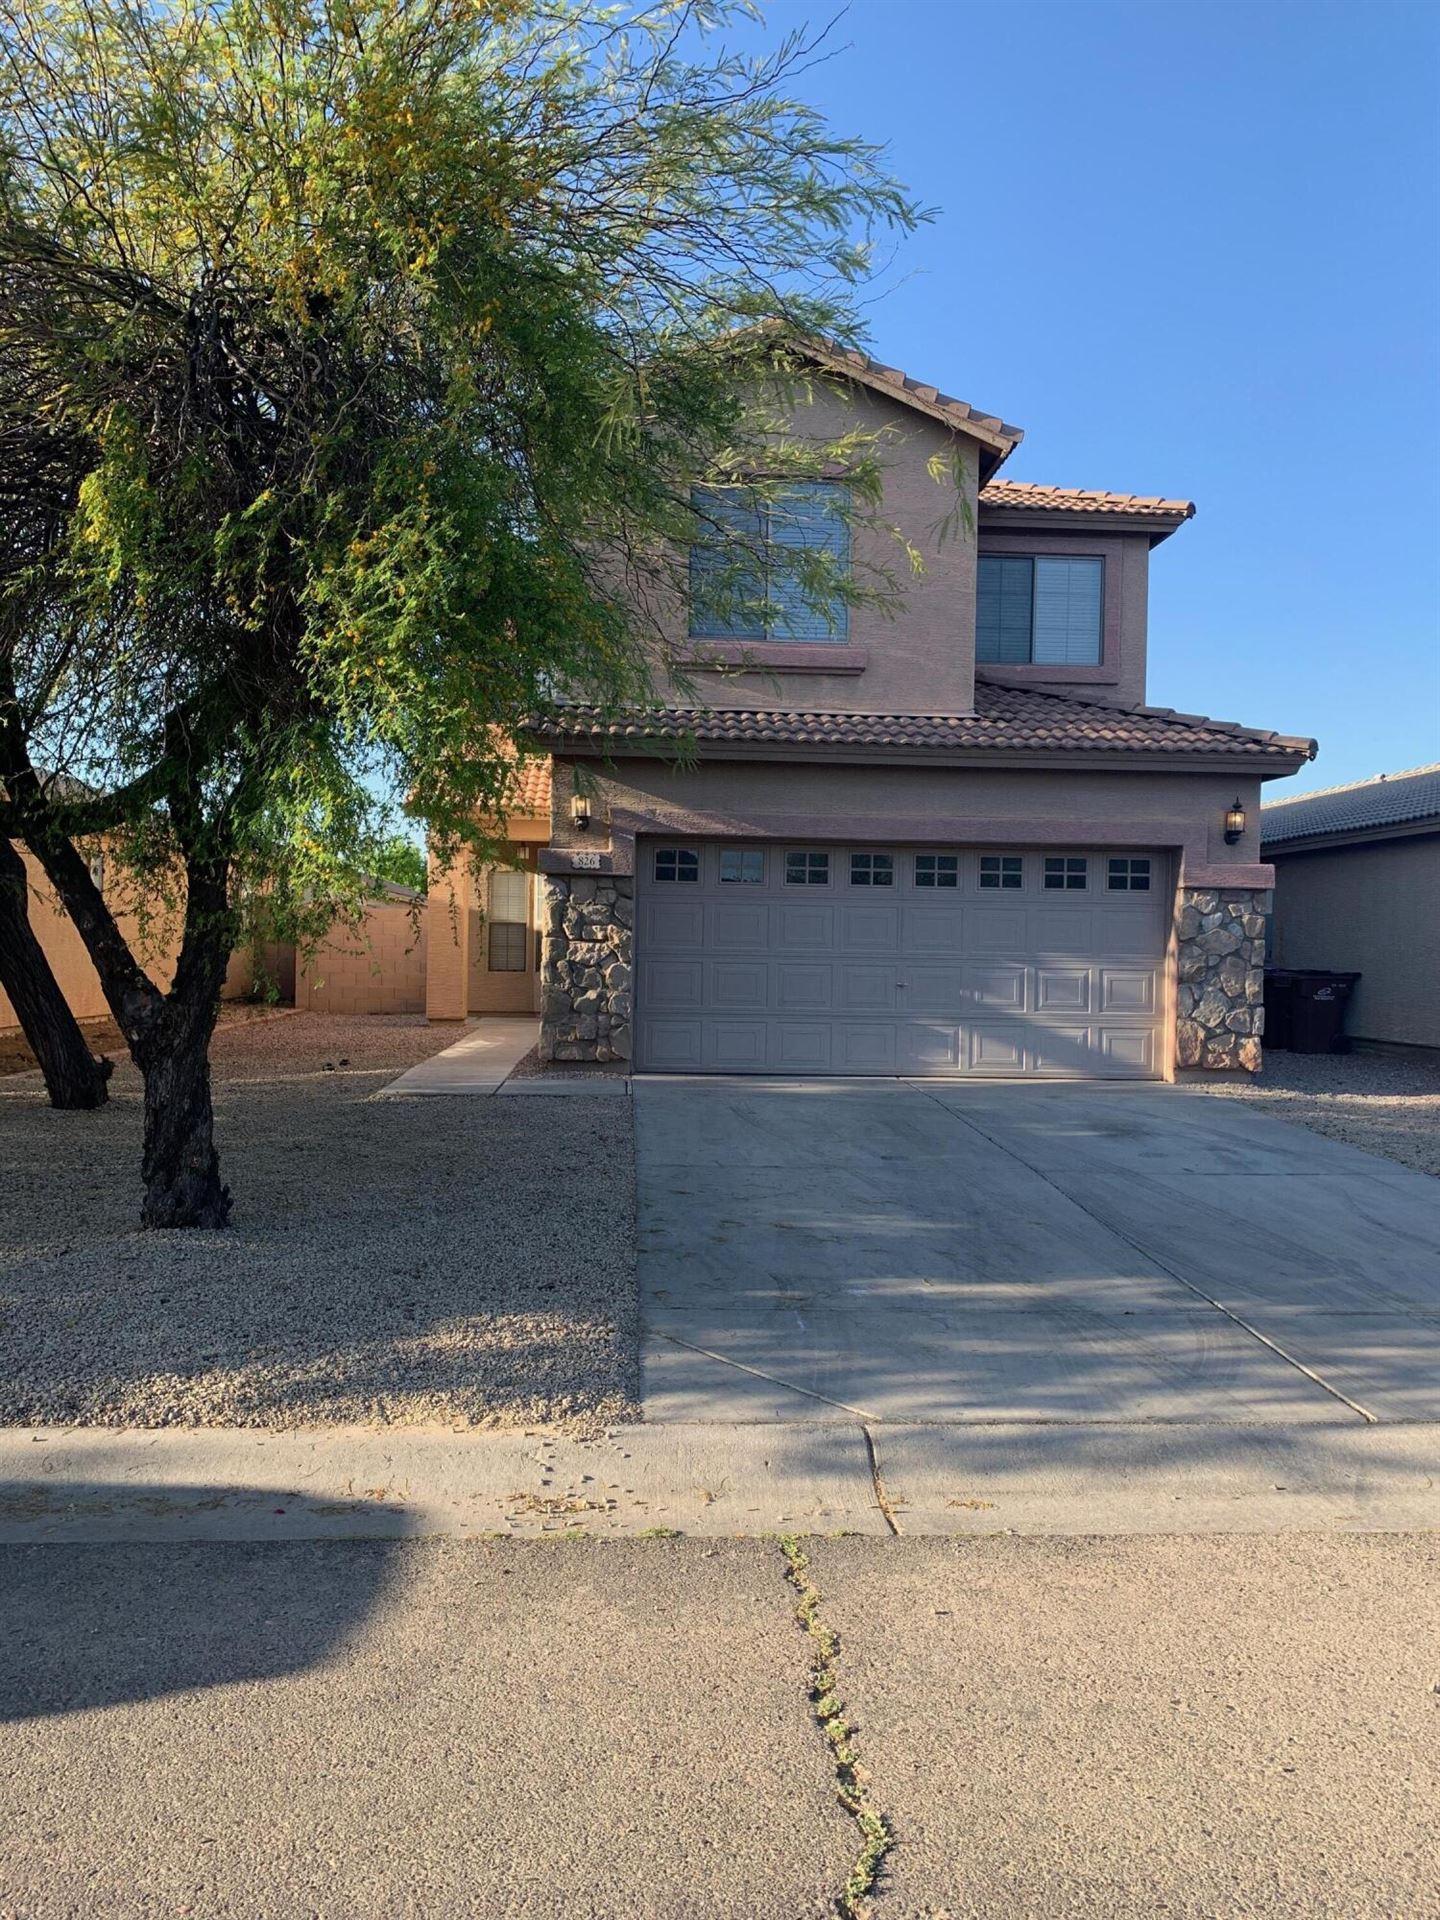 826 E MONTELEONE Street, San Tan Valley, AZ 85140 - MLS#: 6216236